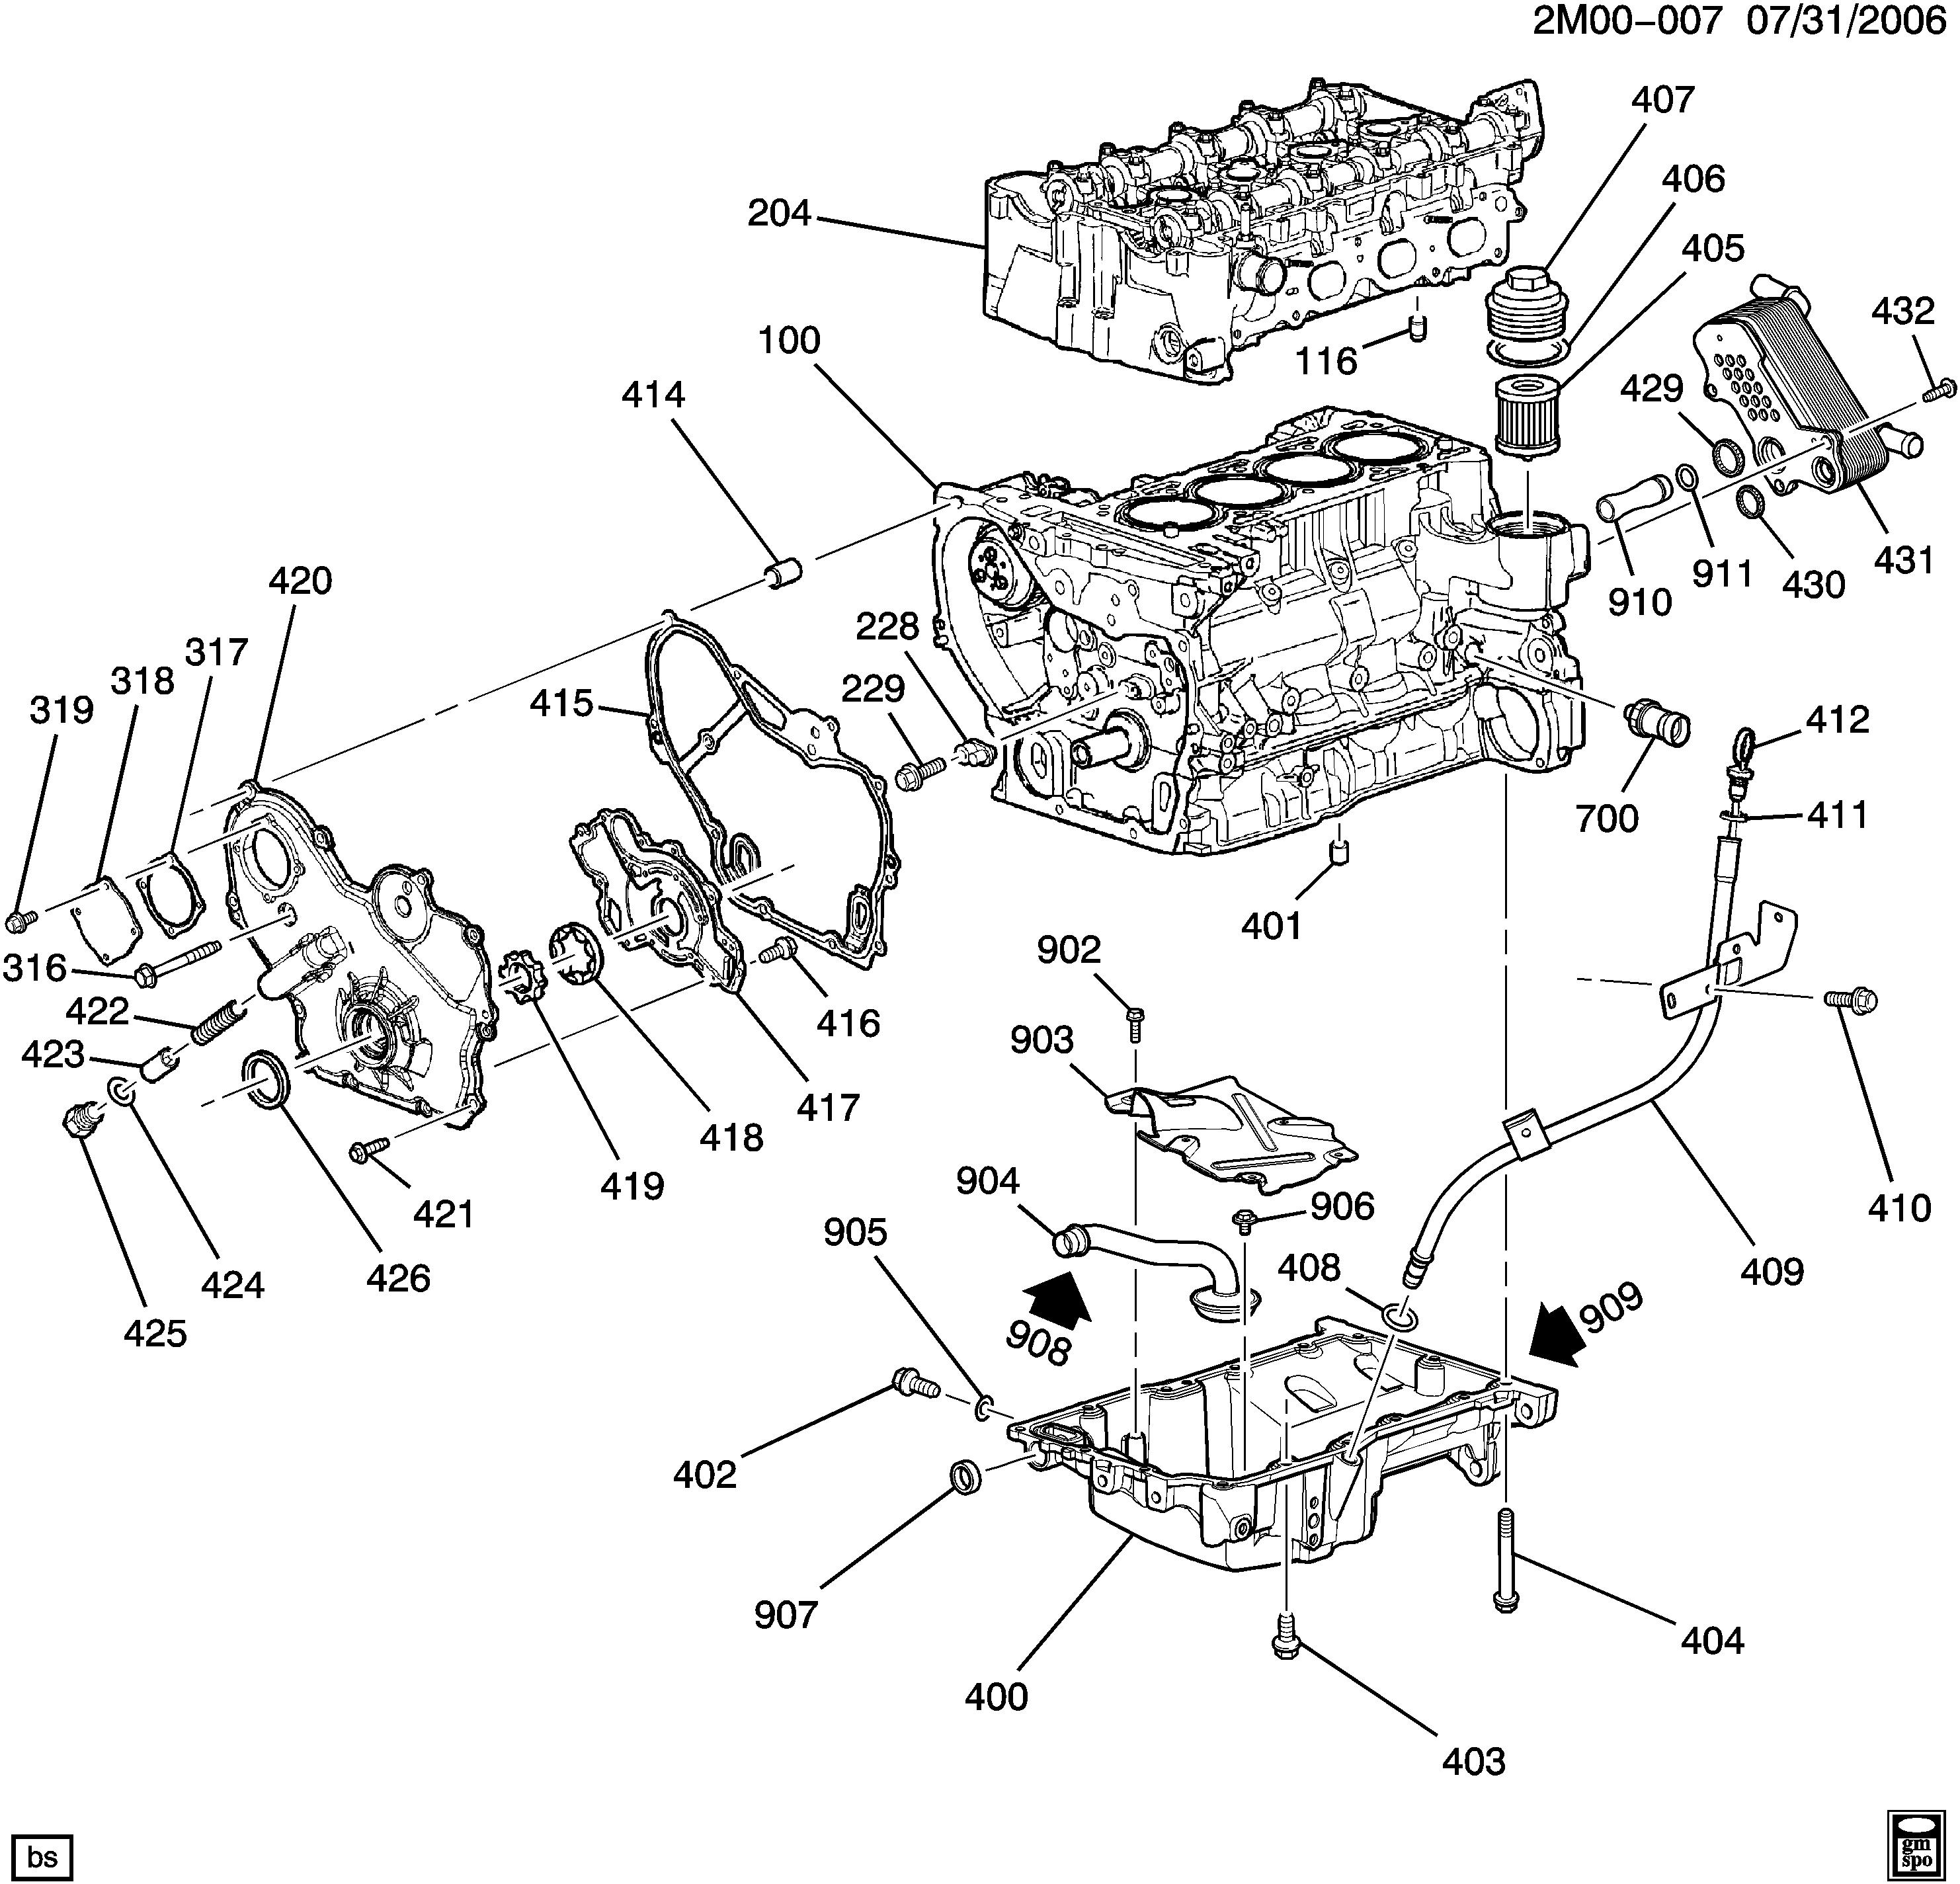 G6 Wiring Diagram Gm